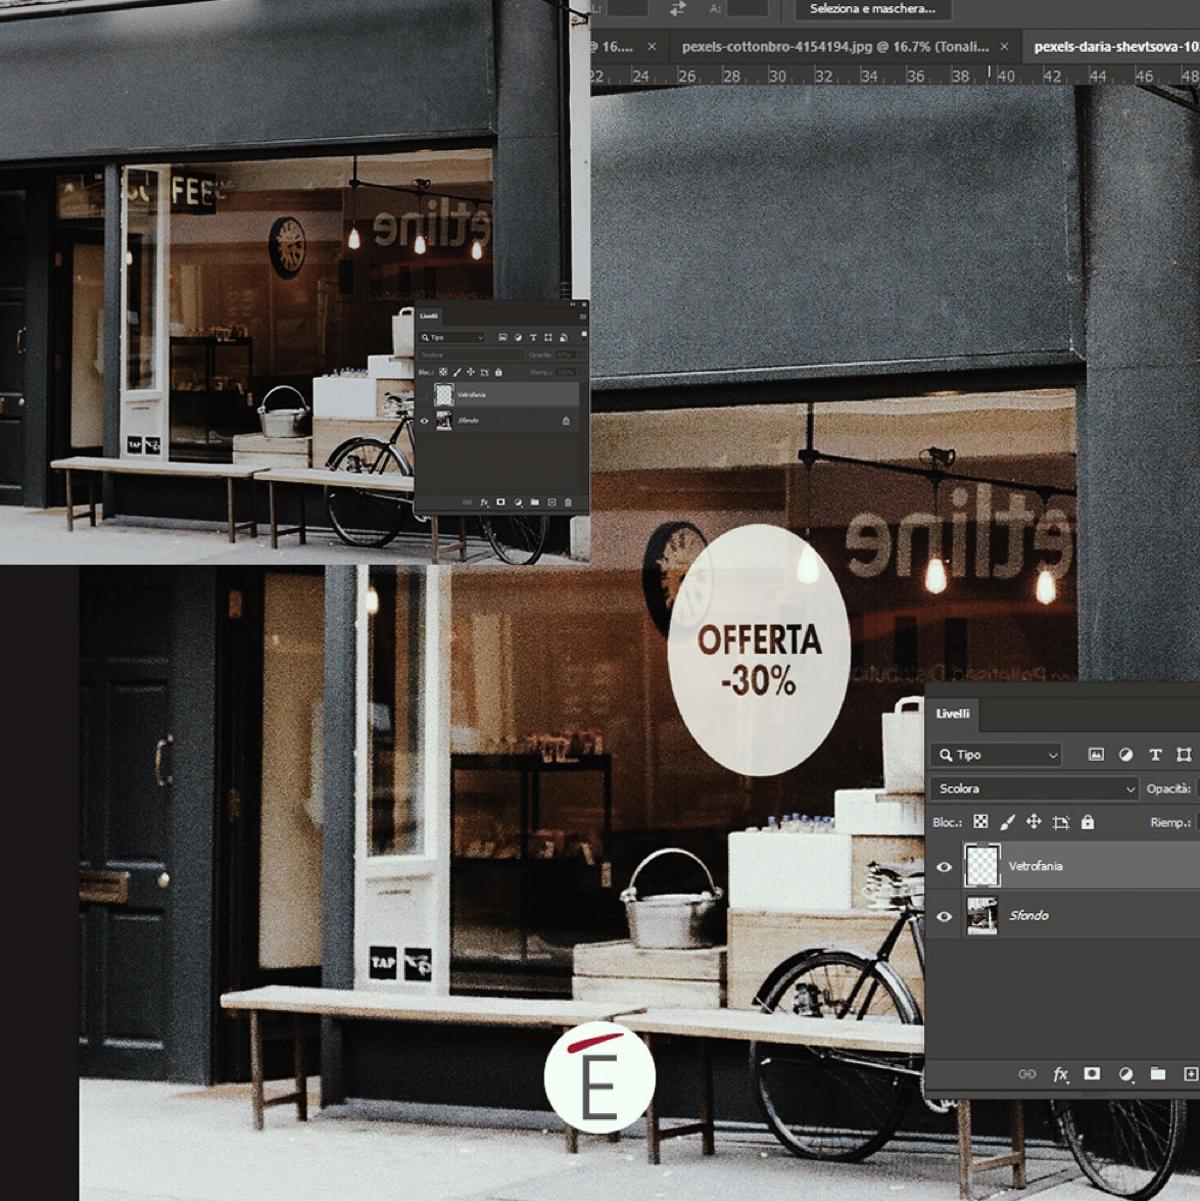 Quali competenze informatiche per i visual merchandiser?